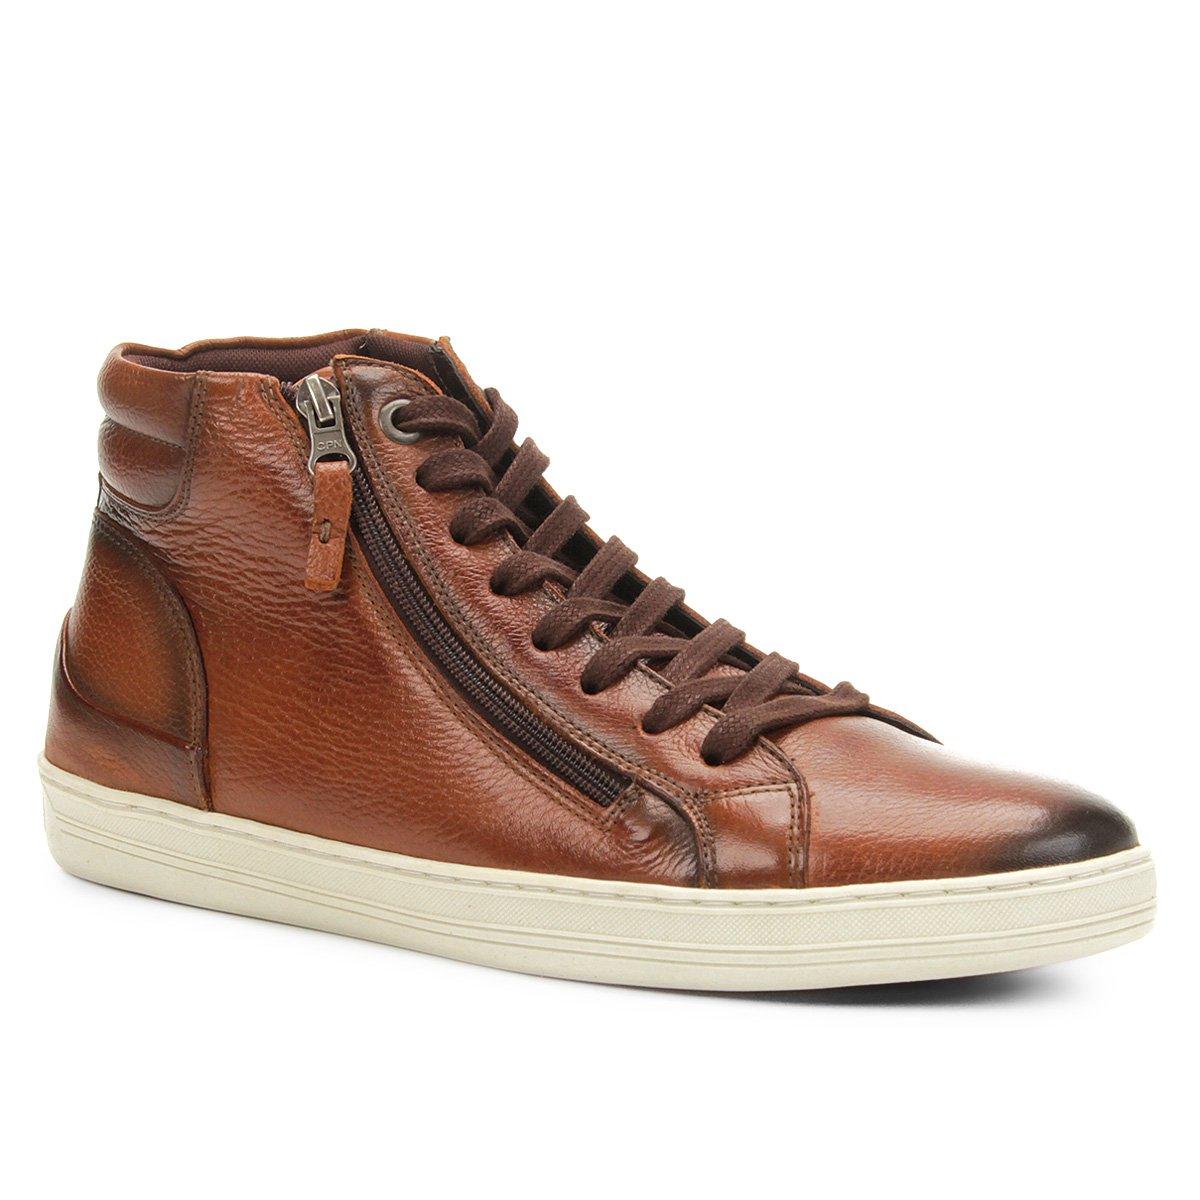 51a27e7a238 Sapatênis Couro Shoestock Cano Alto Zíper Masculino - Compre Agora ...